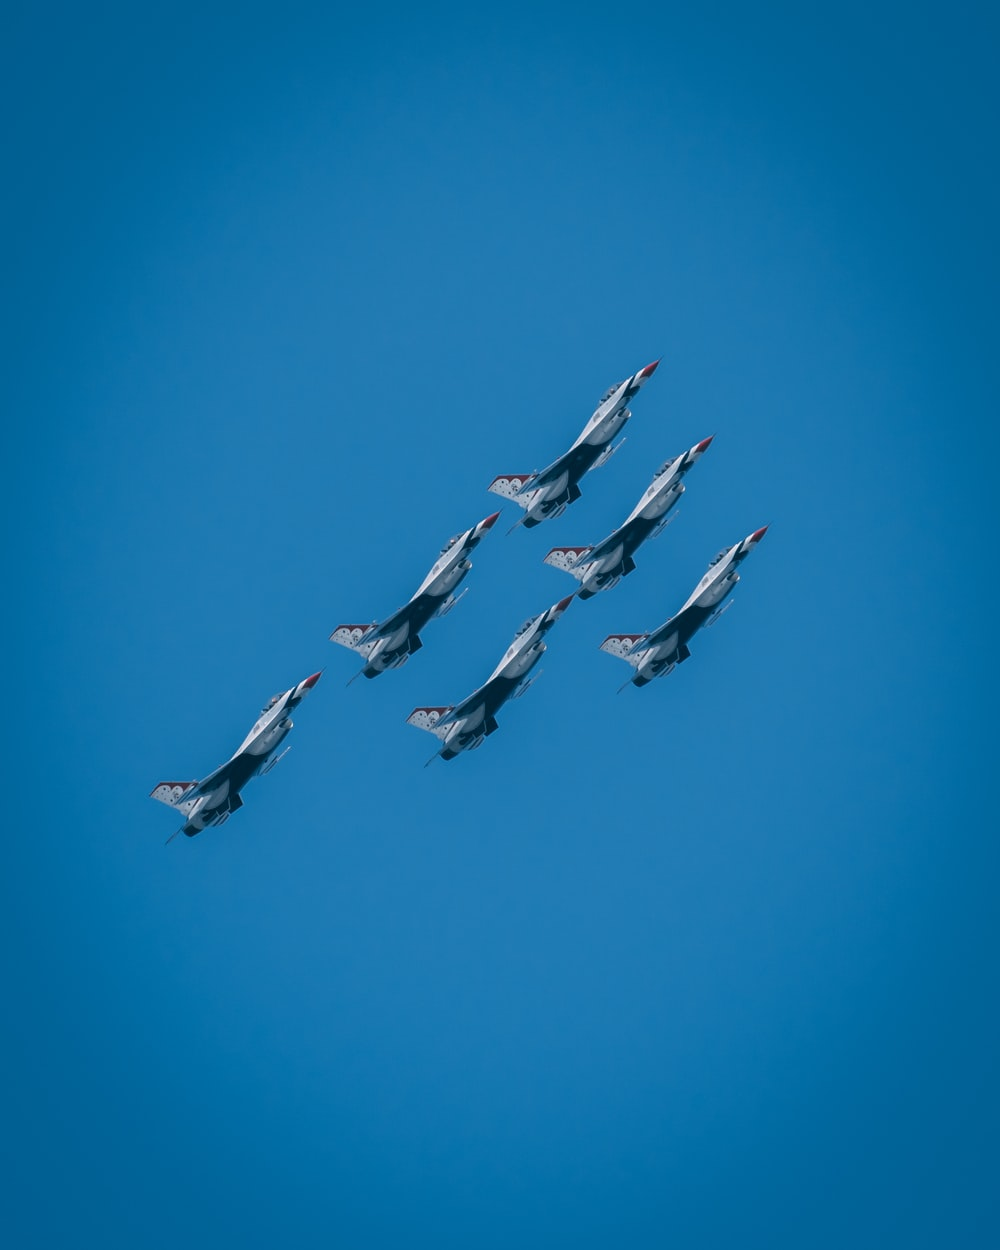 six gray-and-black jet planes